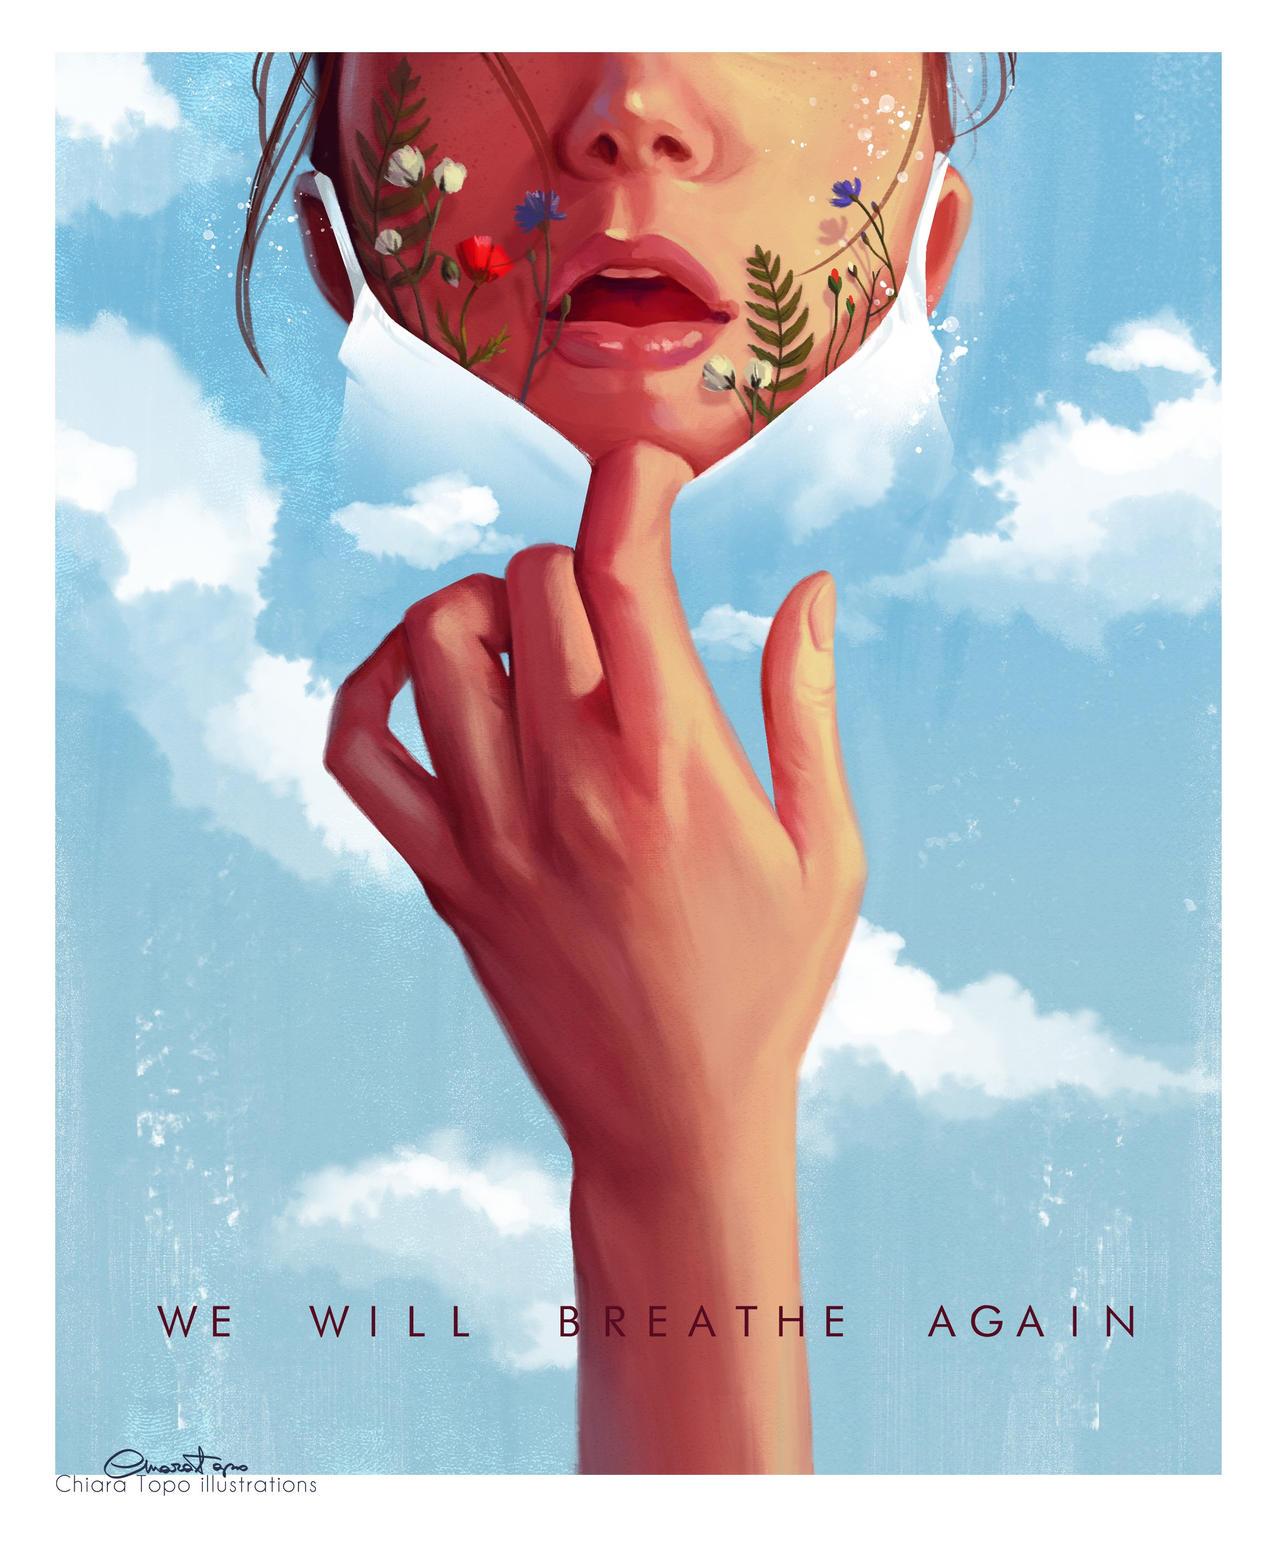 We will breathe again